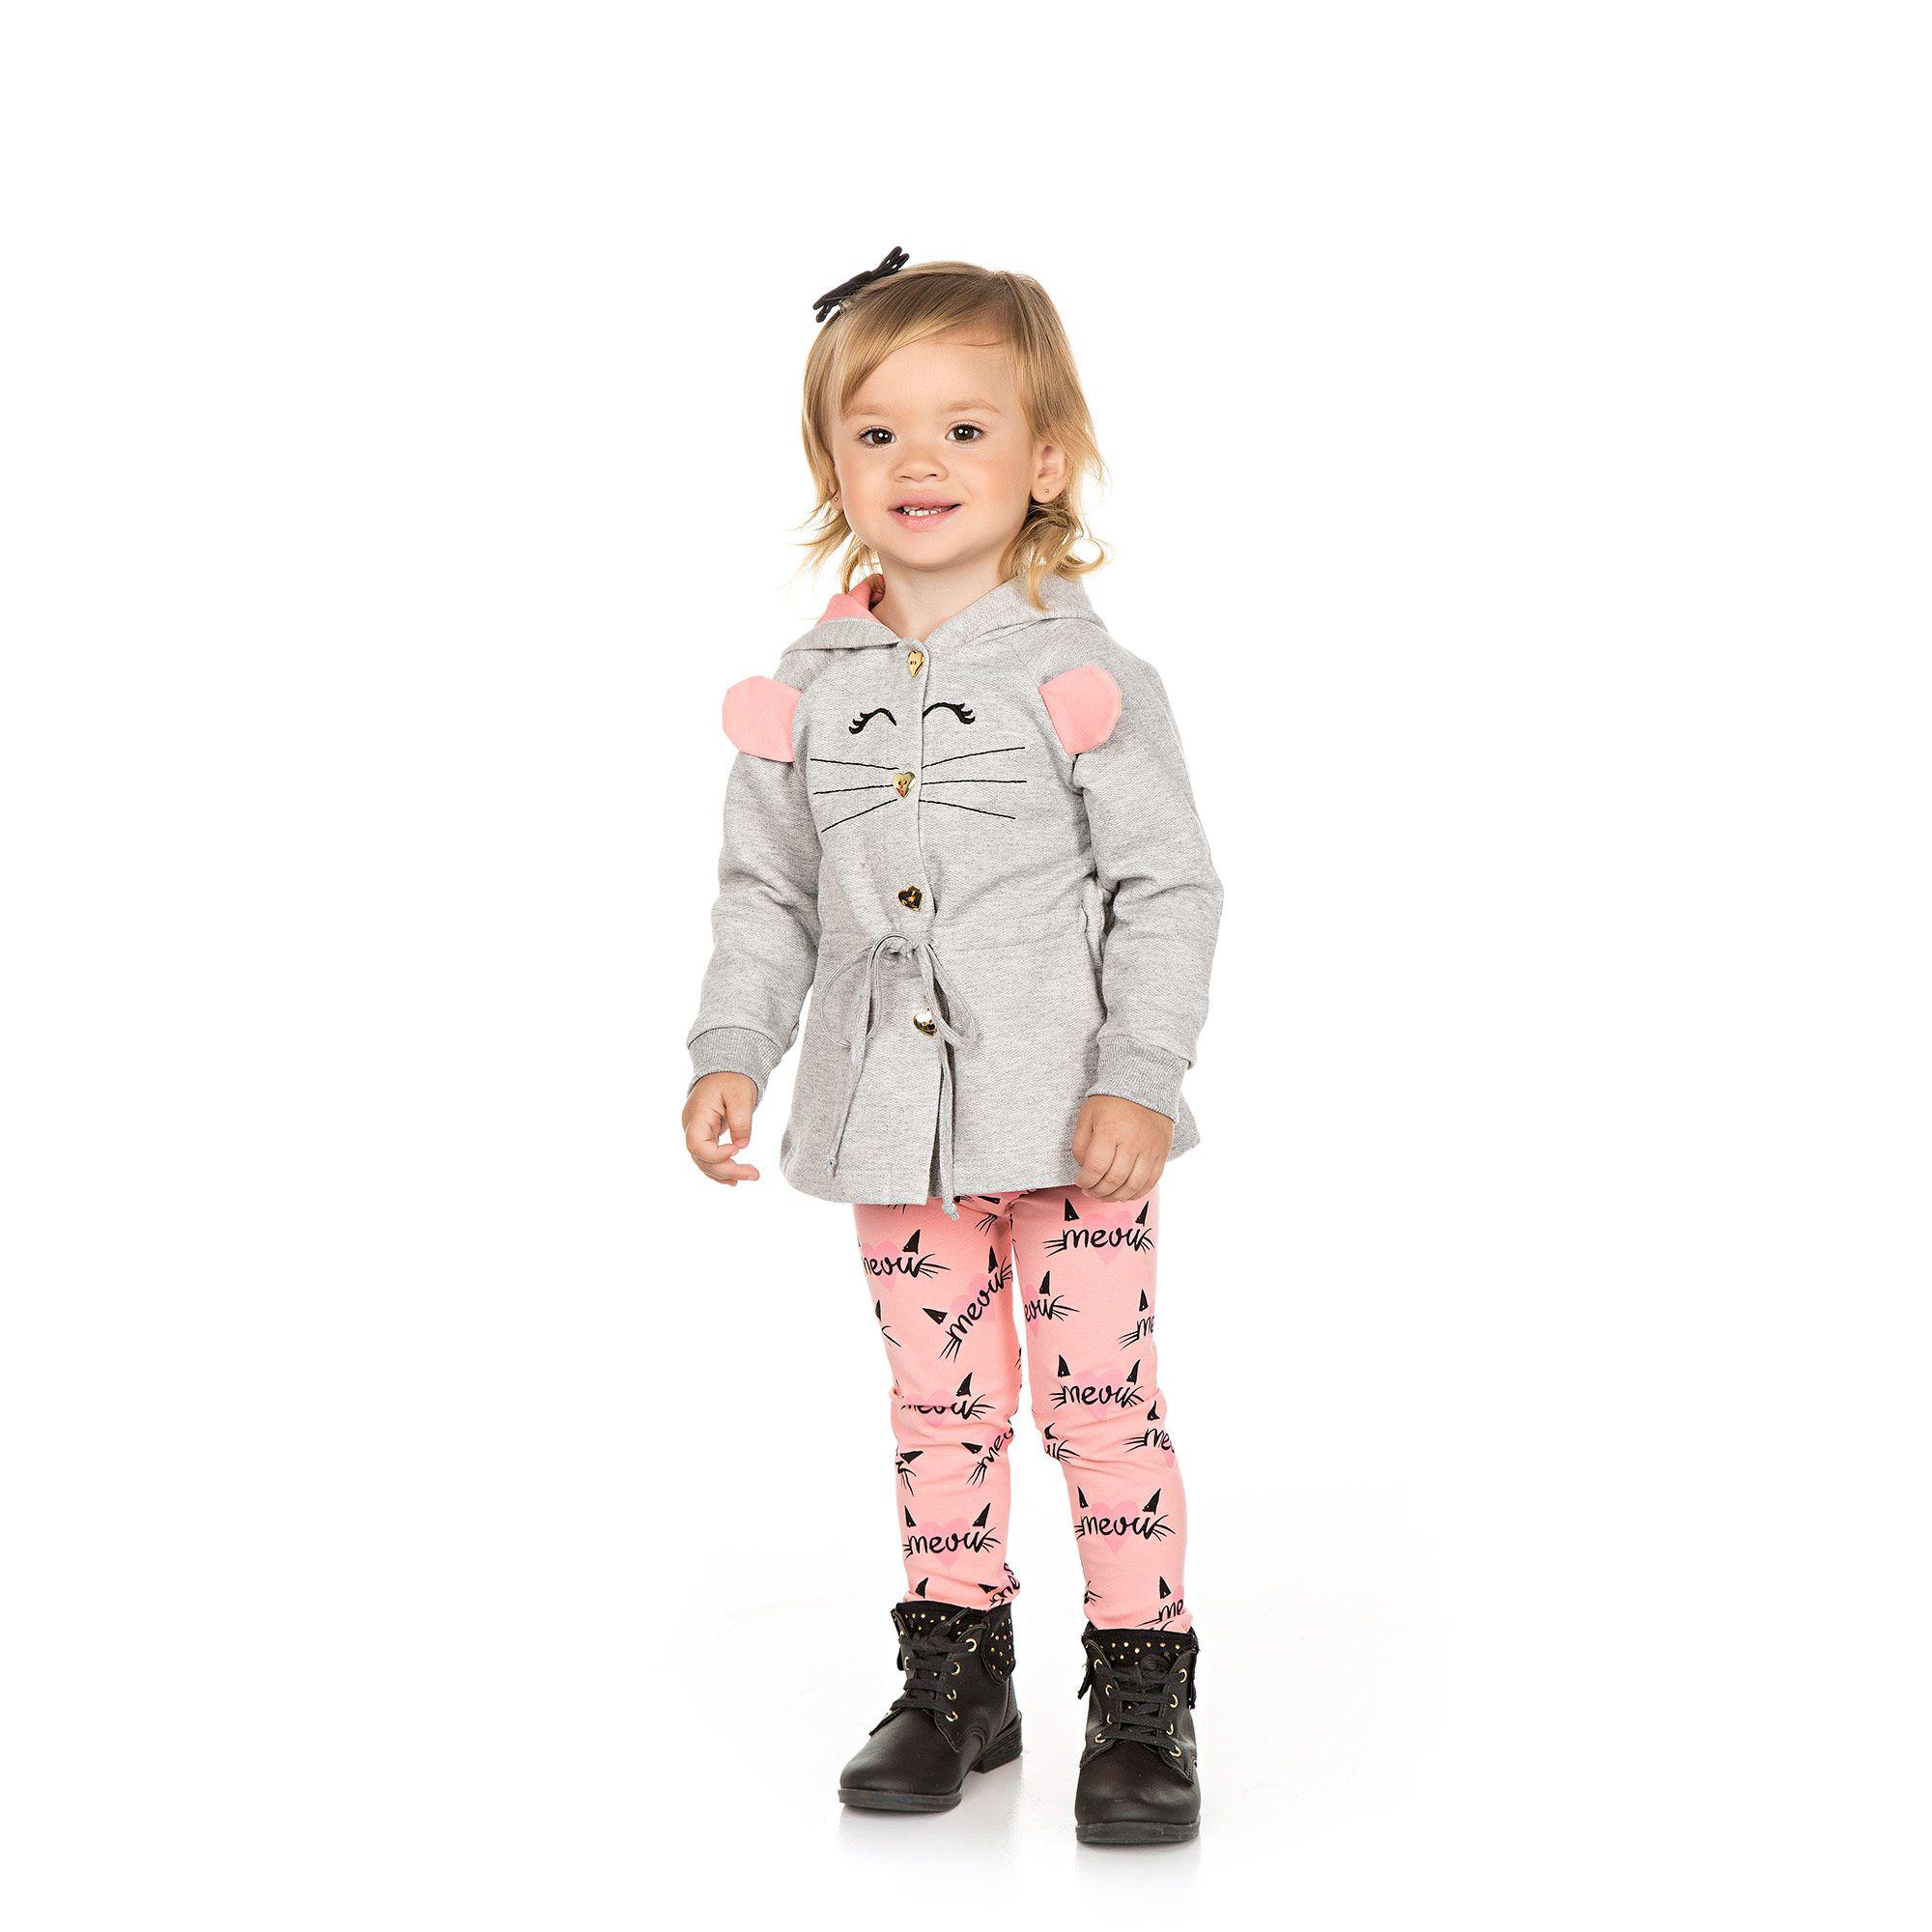 Conjunto Infantil Casaco + Legging 2 peças - Ref 4957 - Mescla/Tutti Frutti